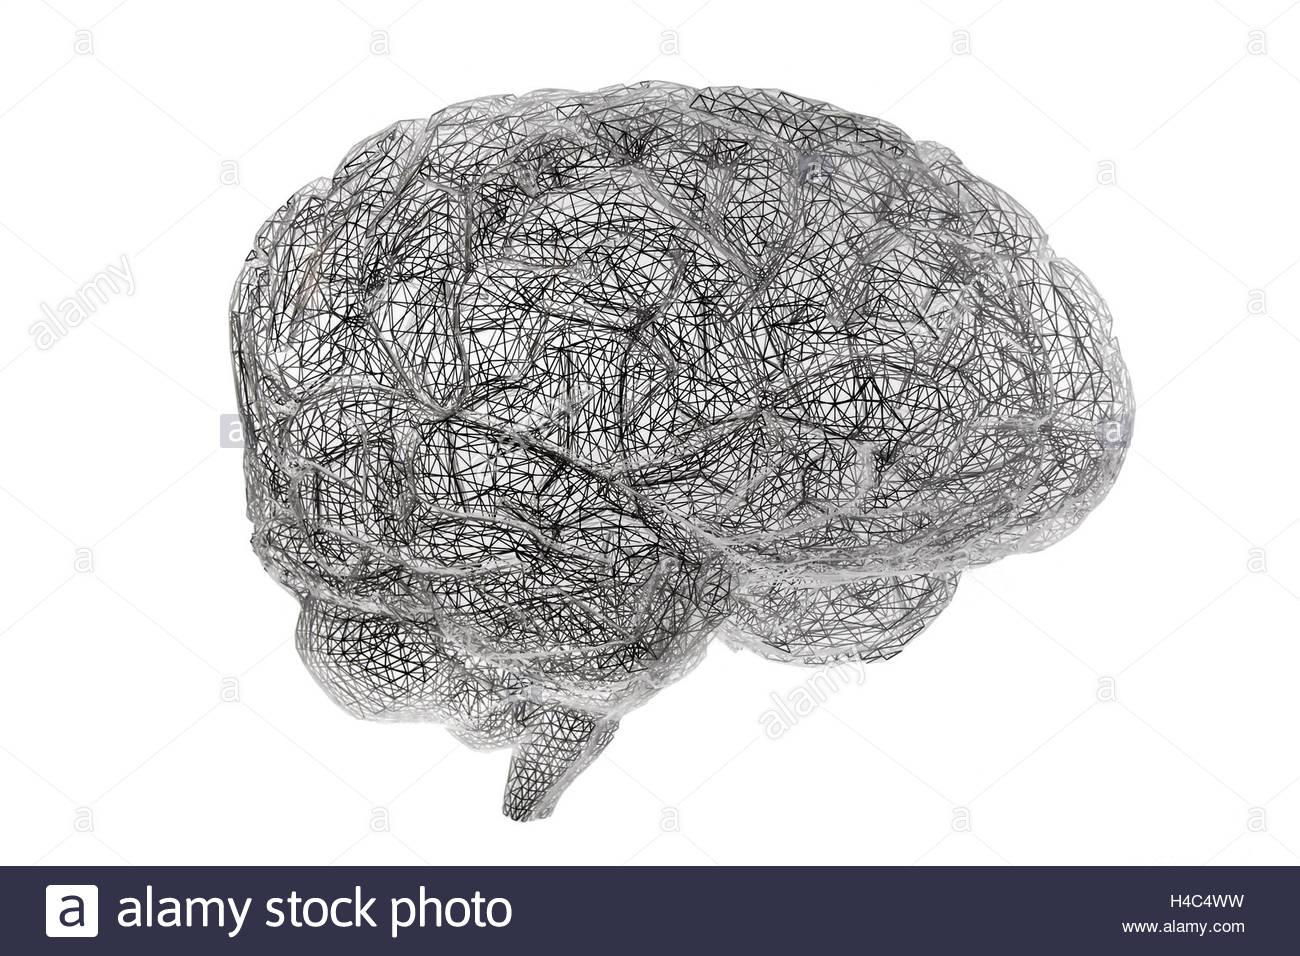 Wired brain model rendering on white background, Museum of Human Evolution Burgos Spain Europe - Stock Image